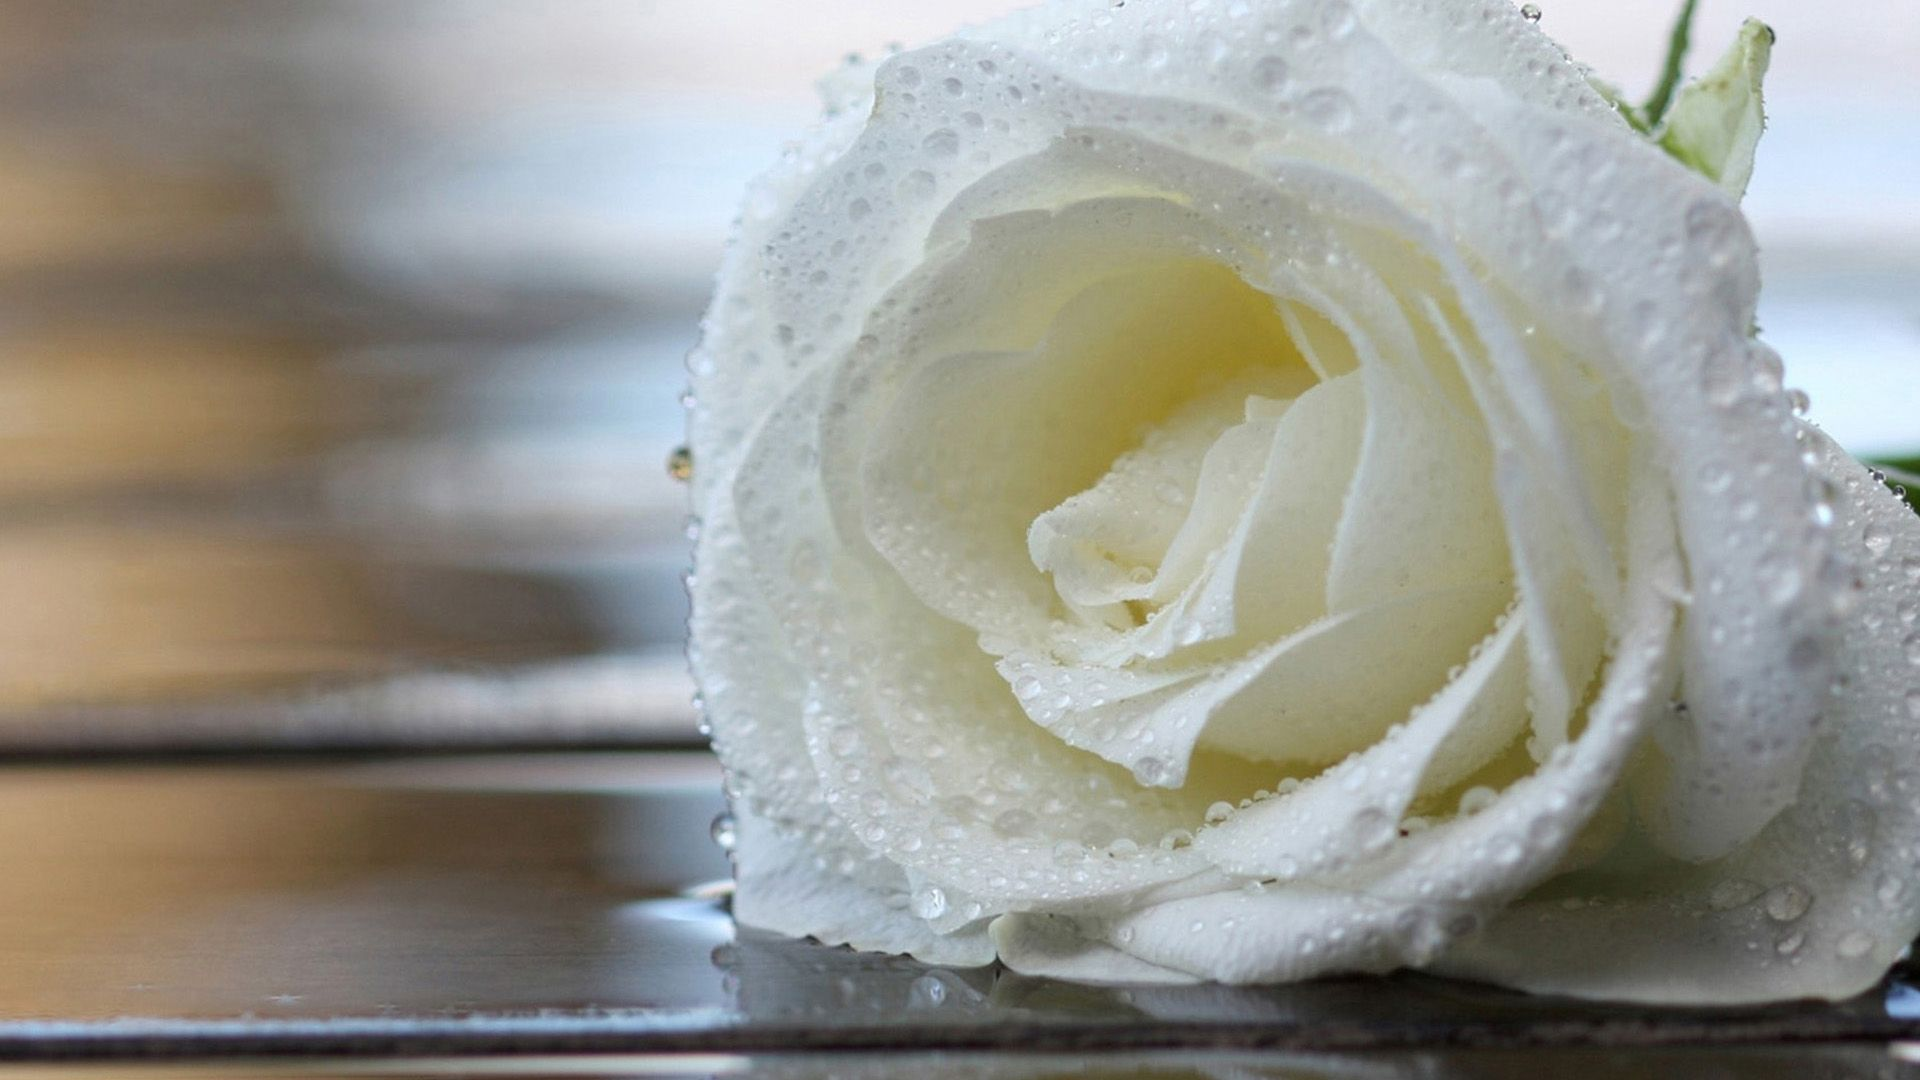 Most Beautiful White Rose High Quality Desktop Image Hd Blue Roses Wallpaper Rose Wallpaper Nature Wallpaper Rose